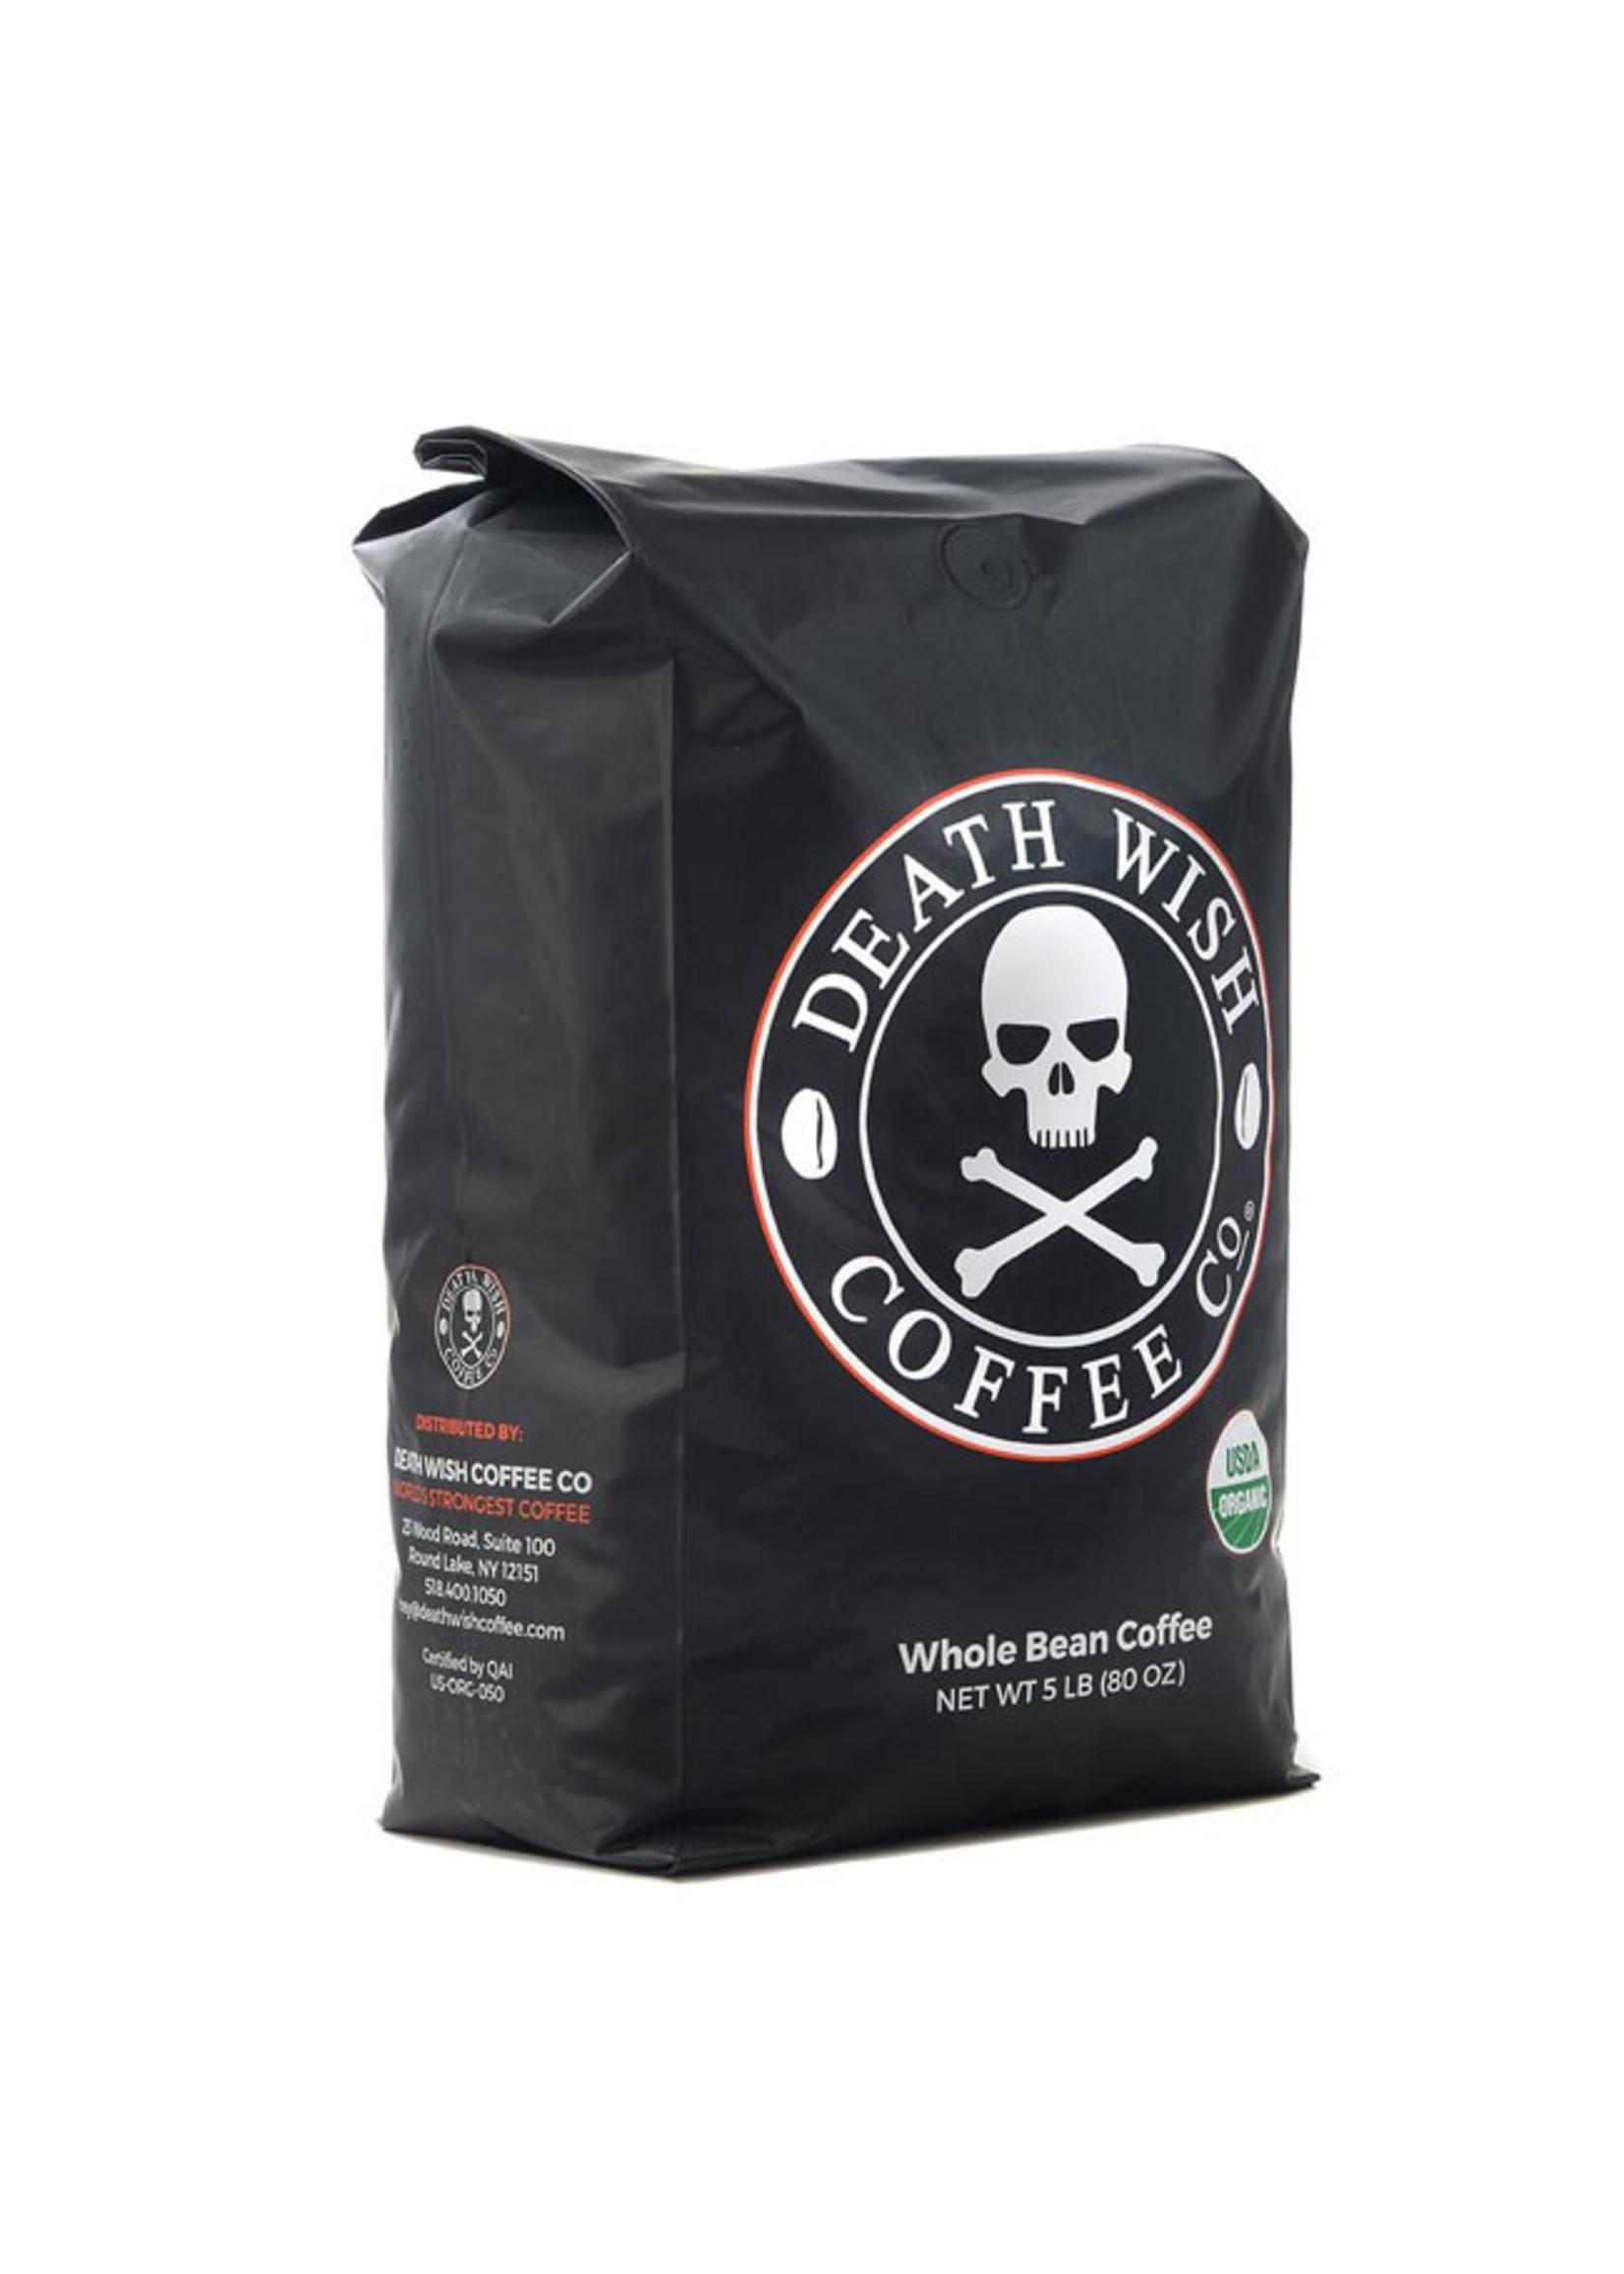 Deathwish Deathwish Whole Bean Coffee